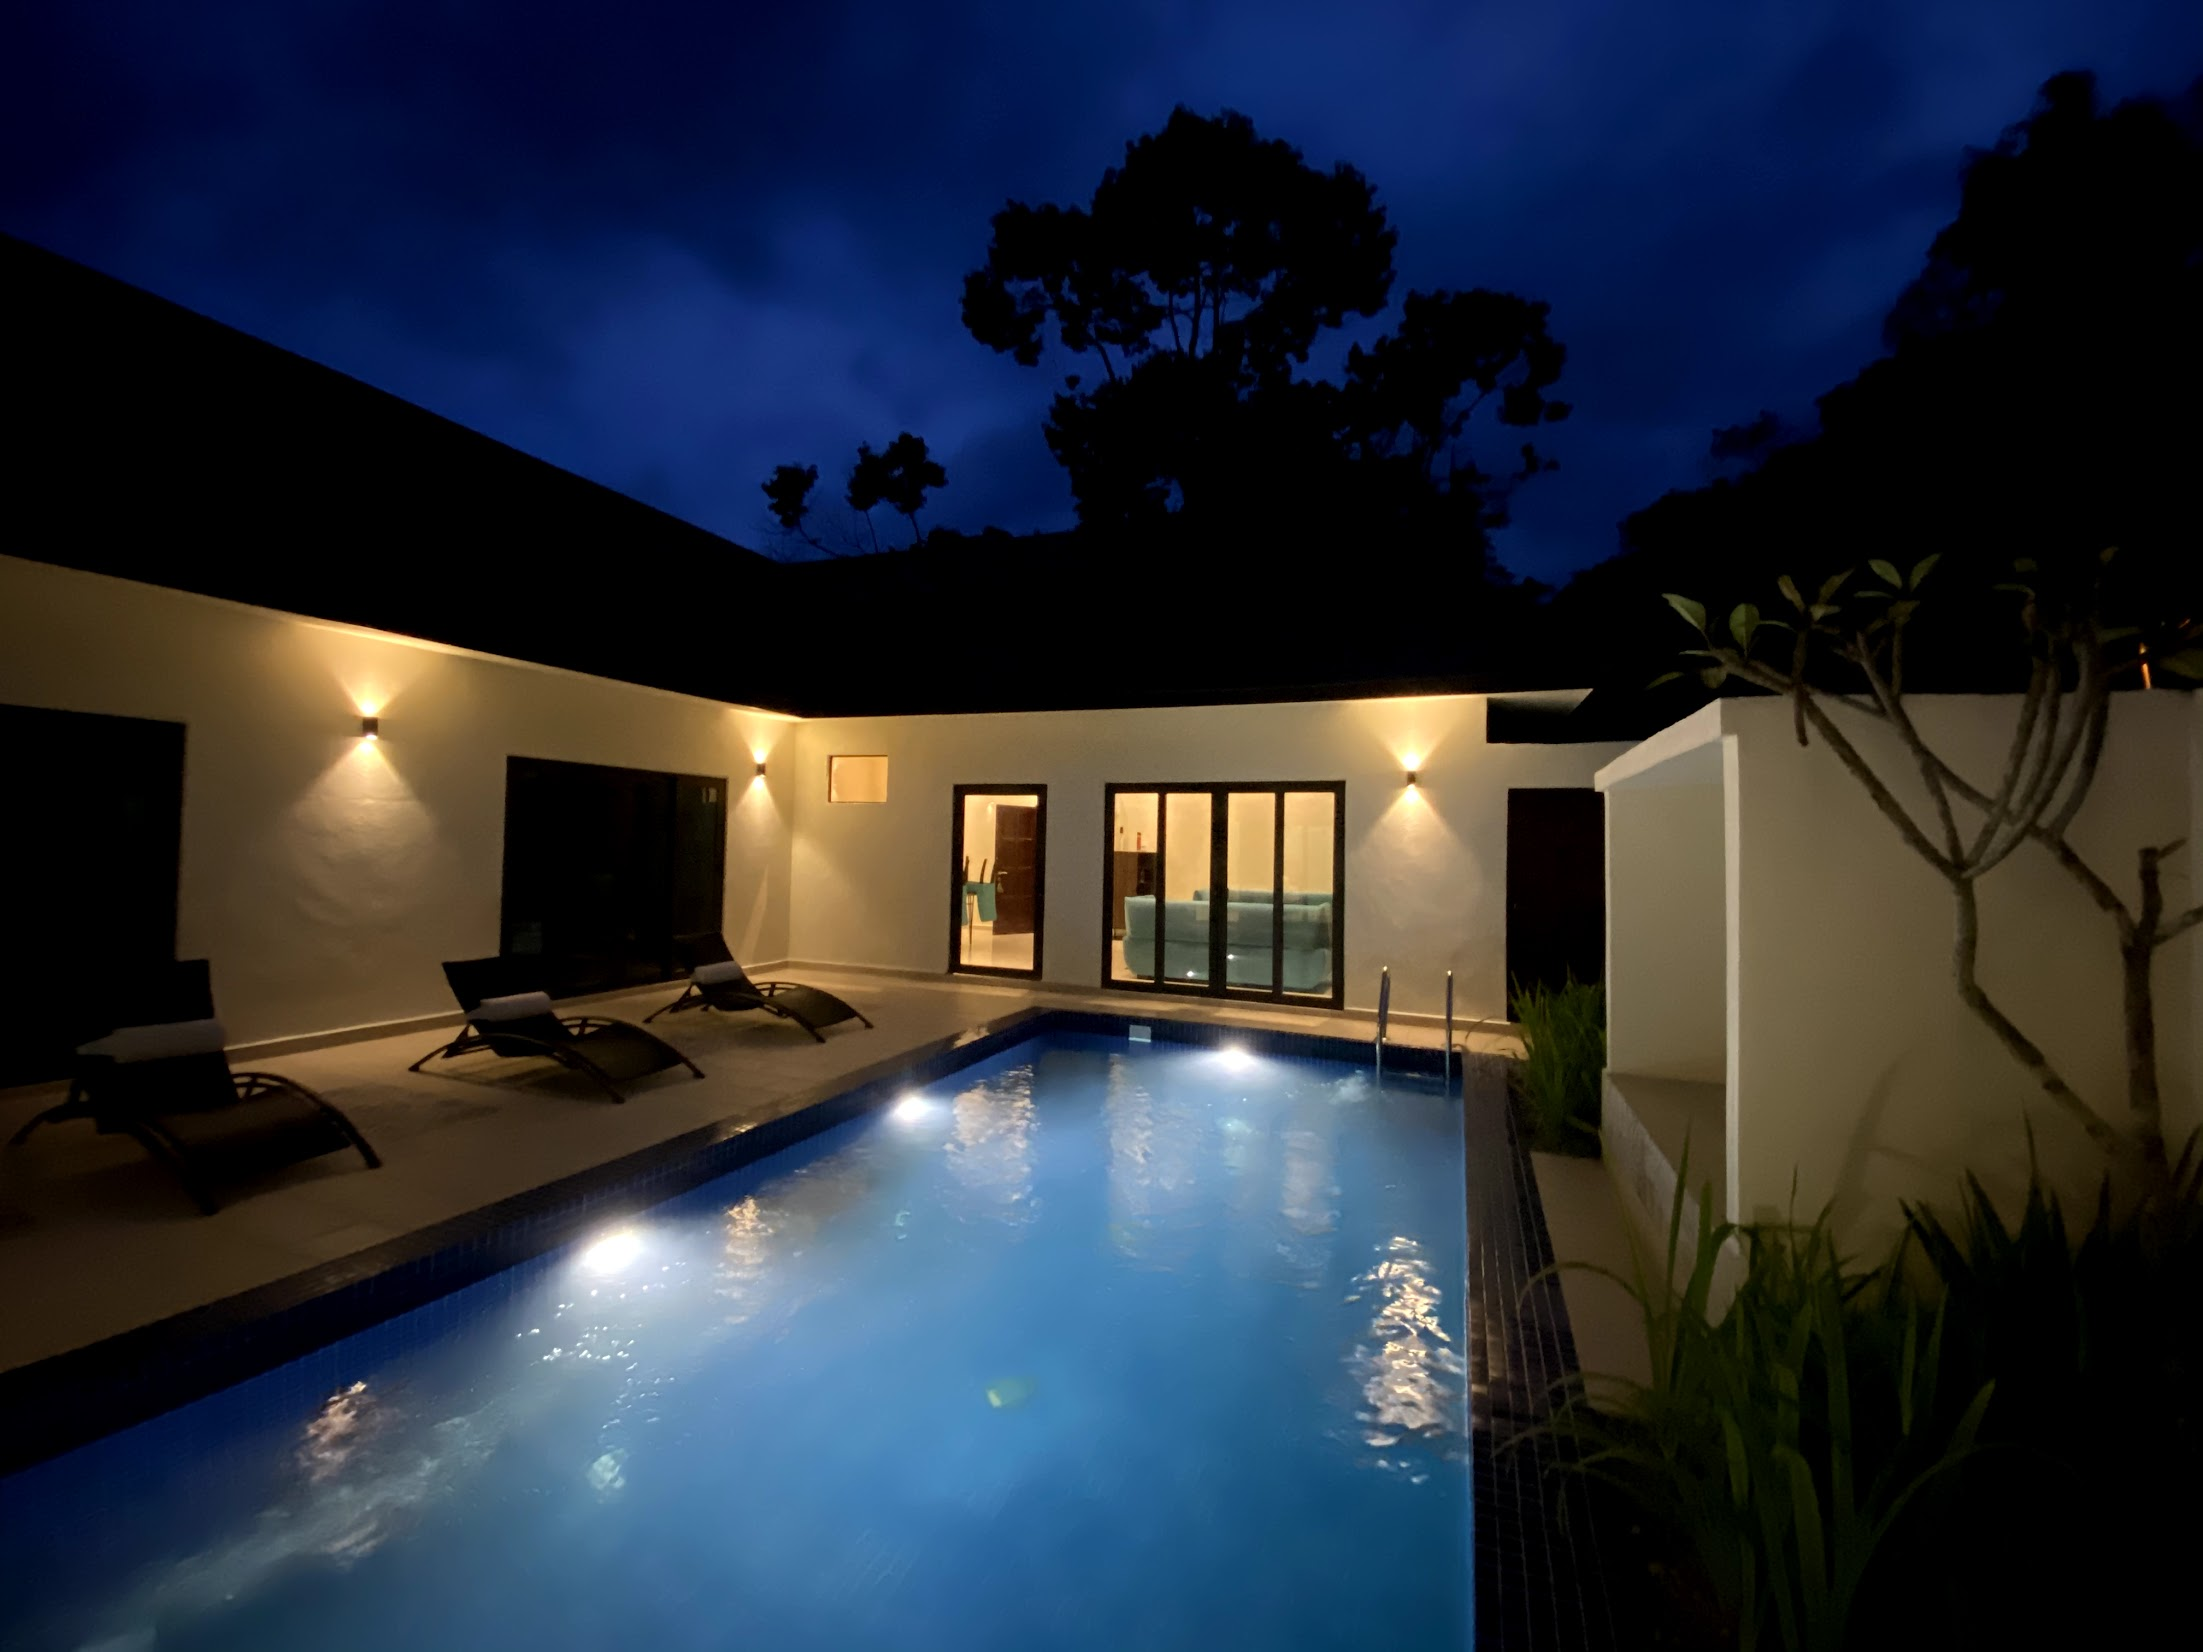 Charis Janda Baik Villa 1 3 Bedroom Private Pool Villas For Rent In Bentong Pahang Malaysia